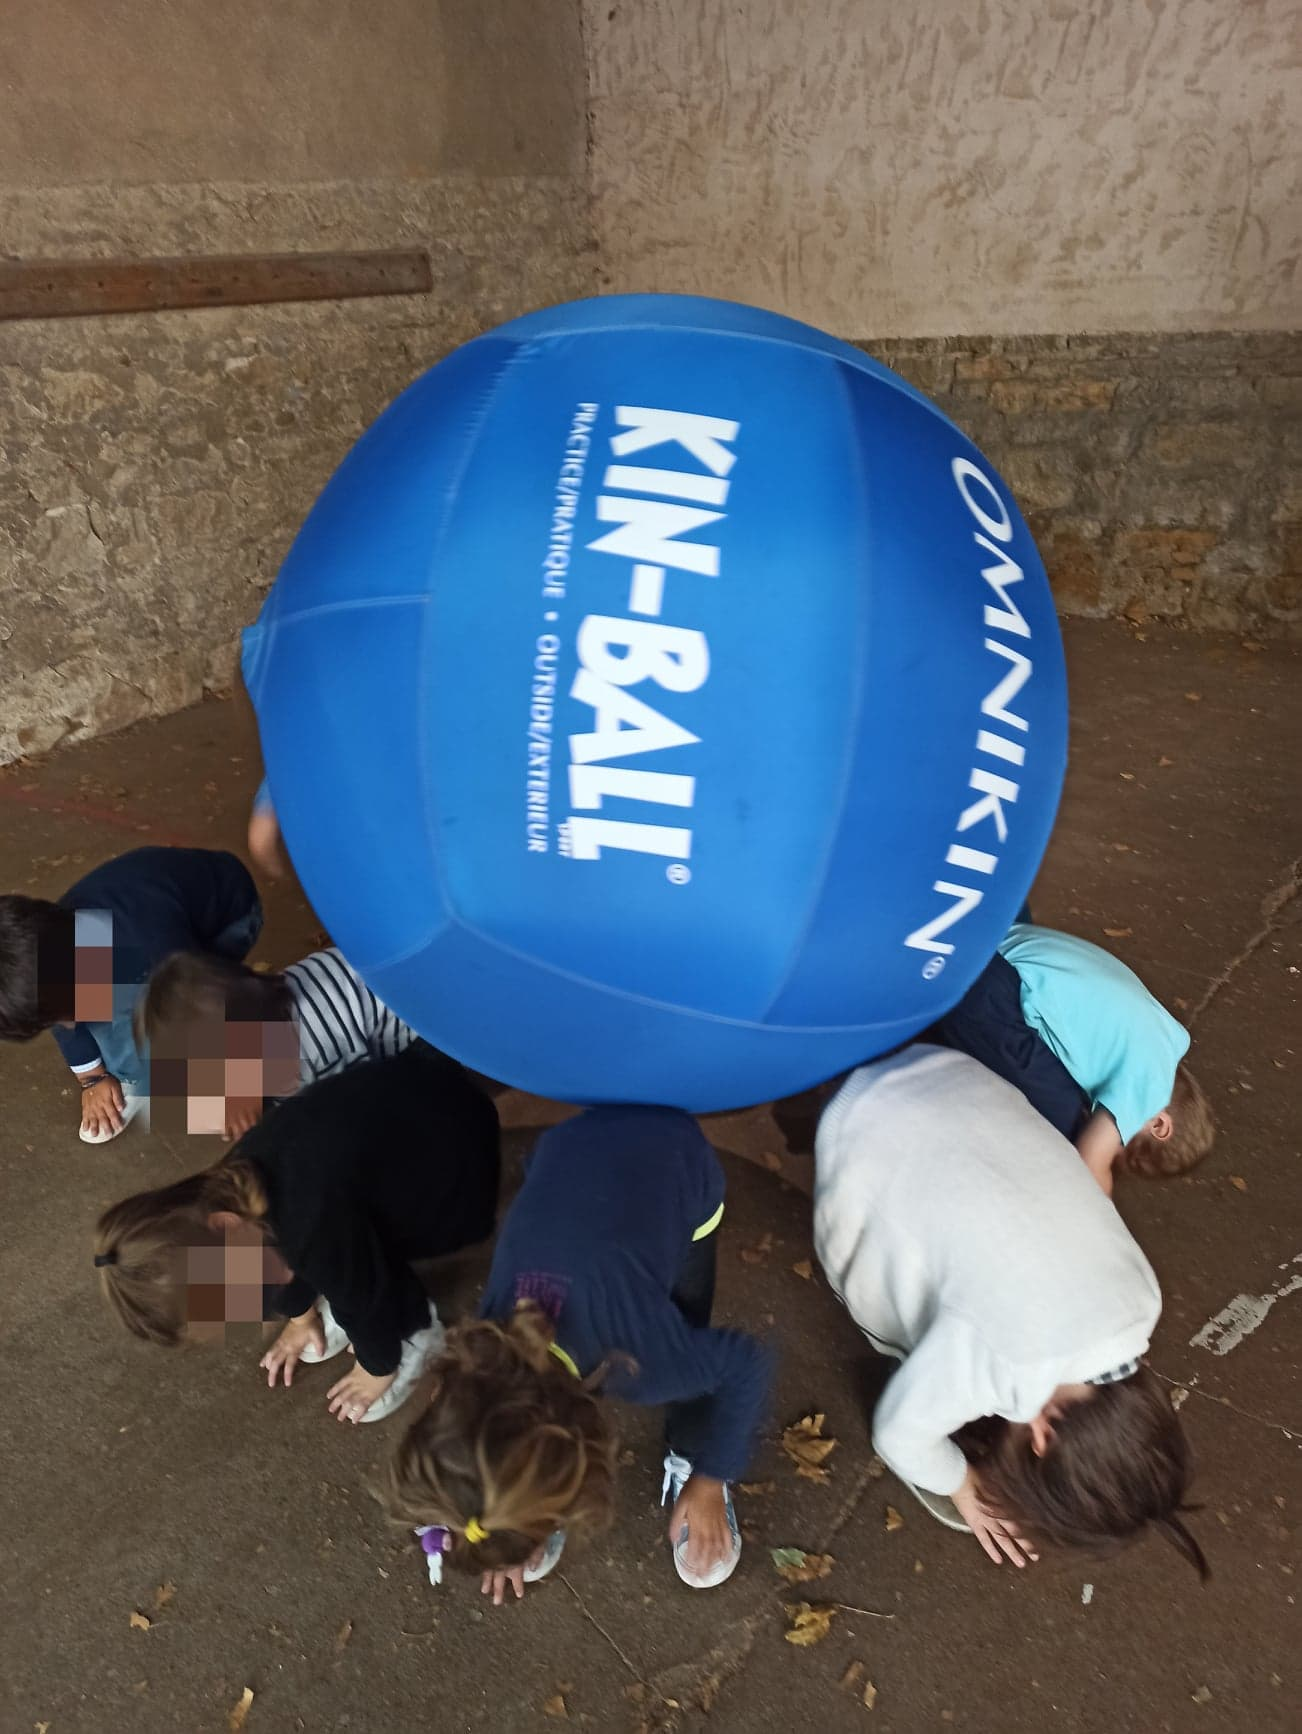 Maintenir un ballon géant